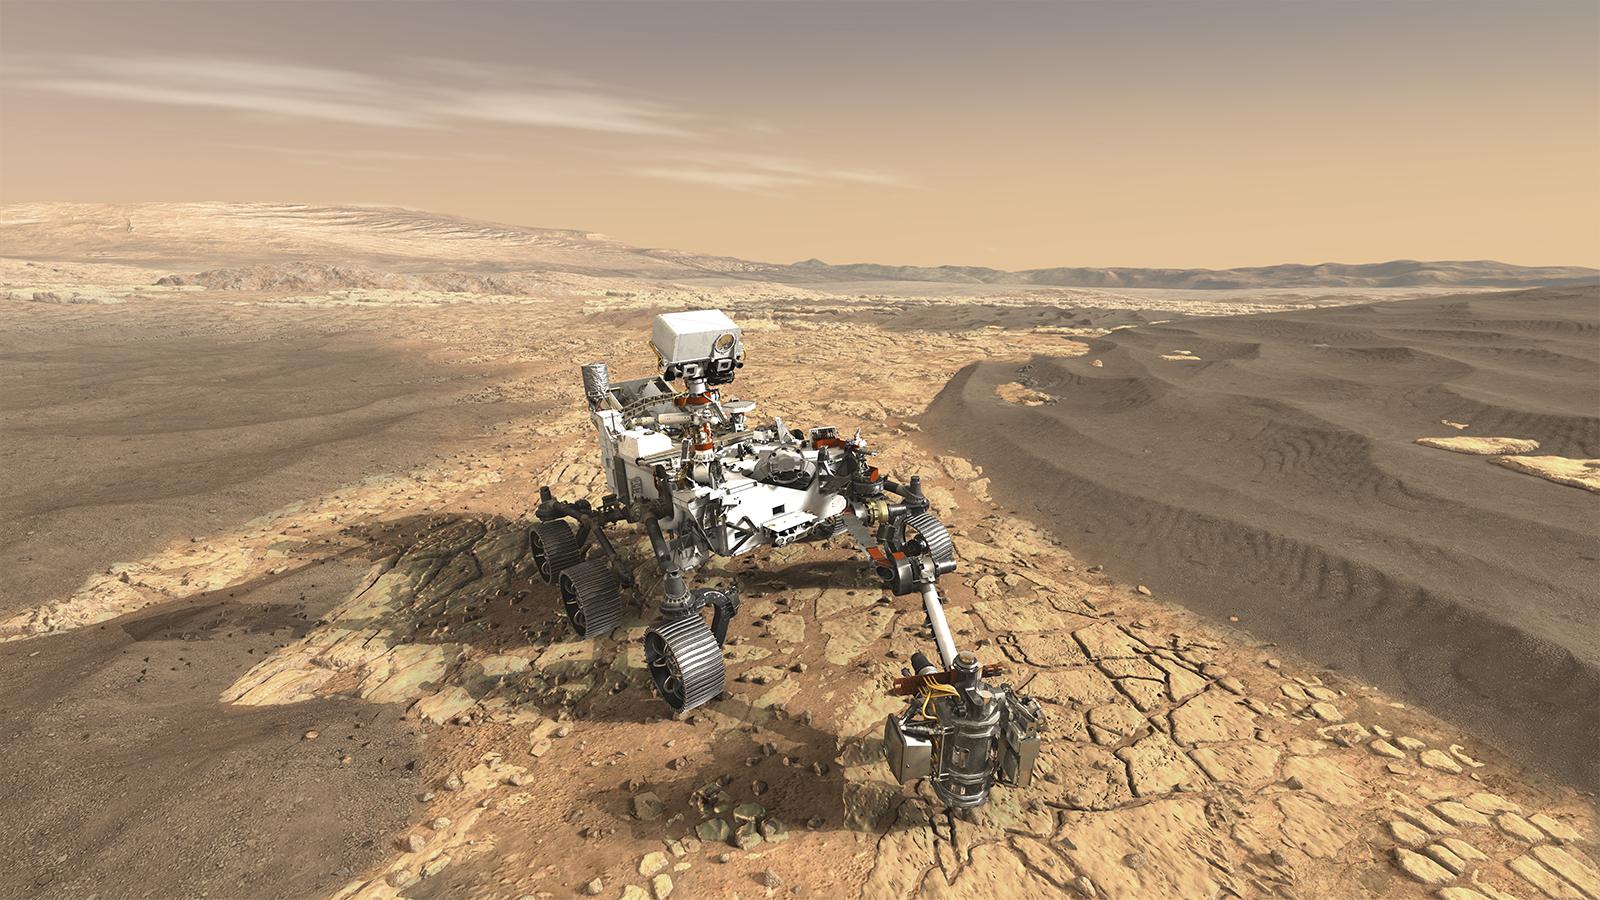 Image of Mars 2020 rover courtesy of NASA/JPL-Caltech